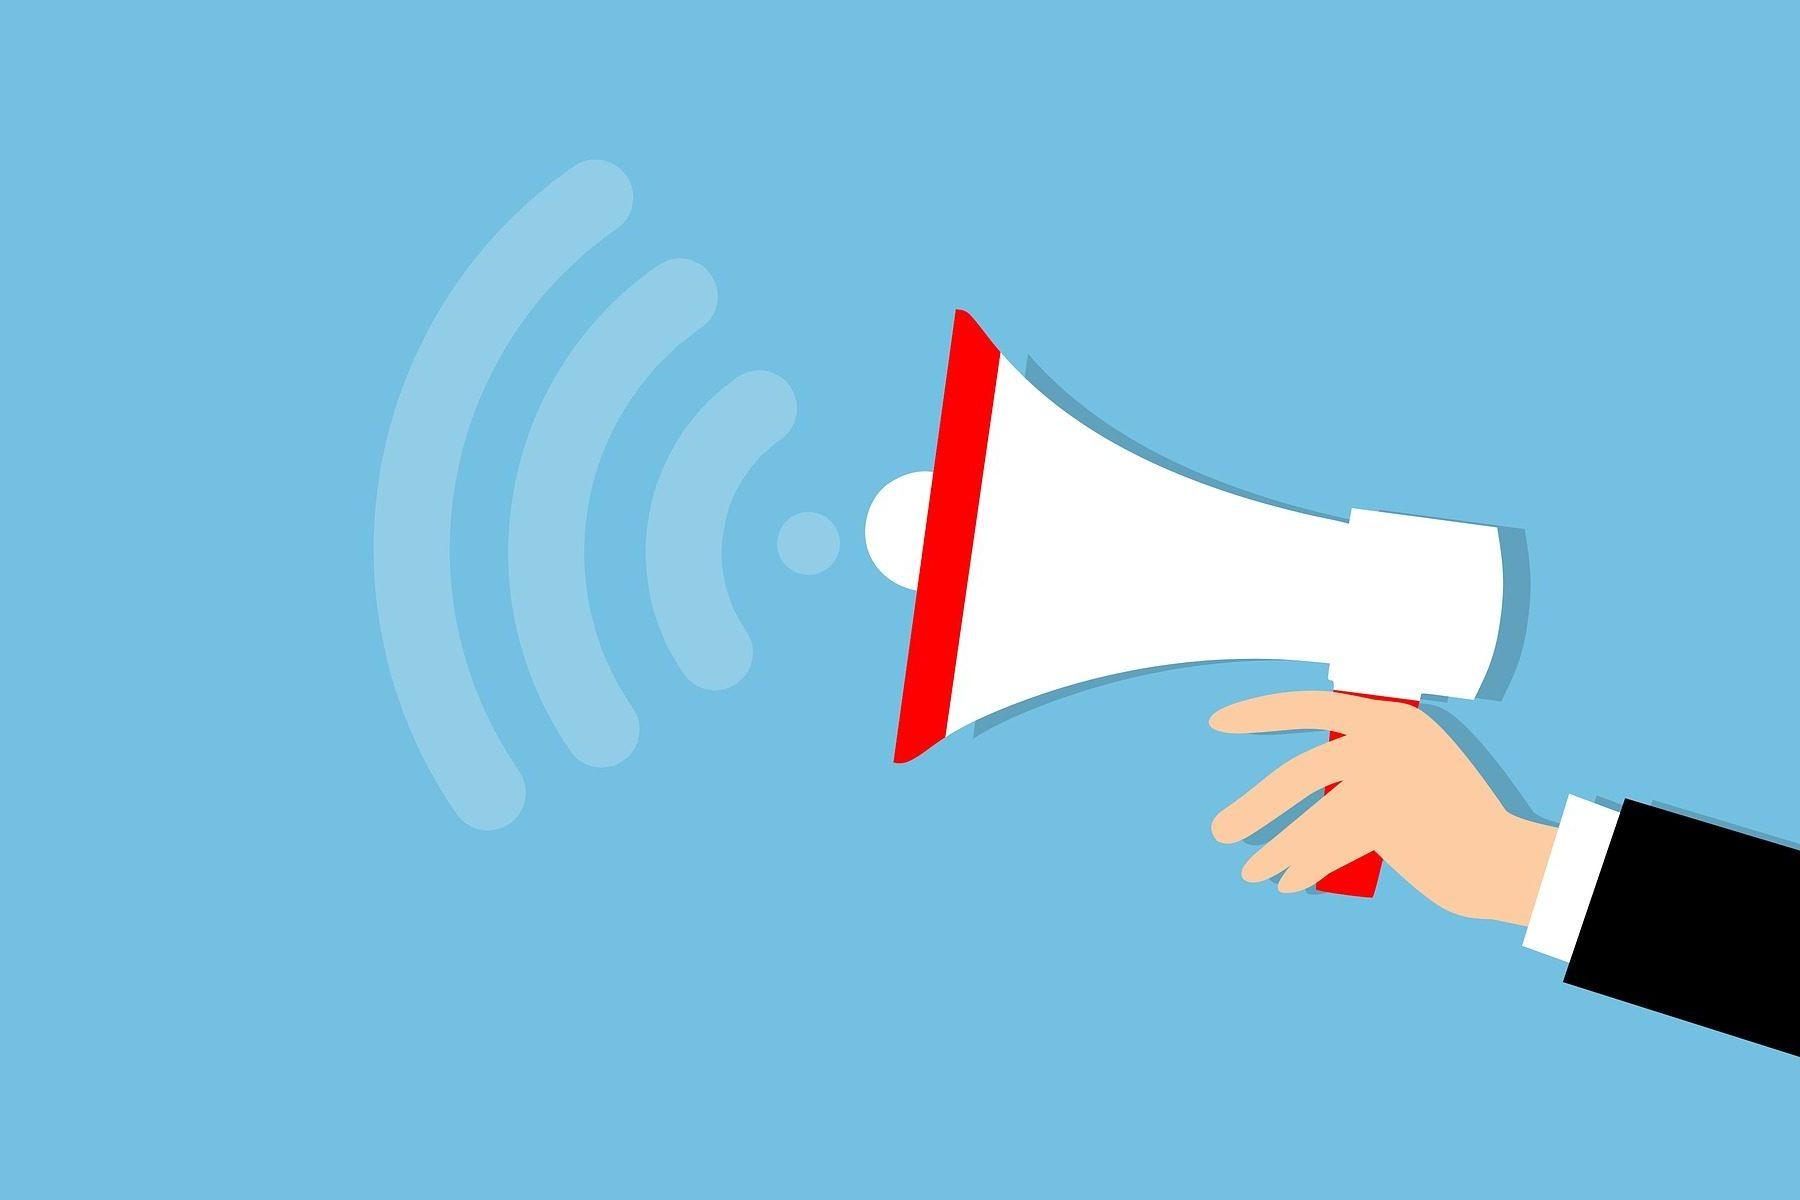 marketing-3740526_1920-e1574441818334